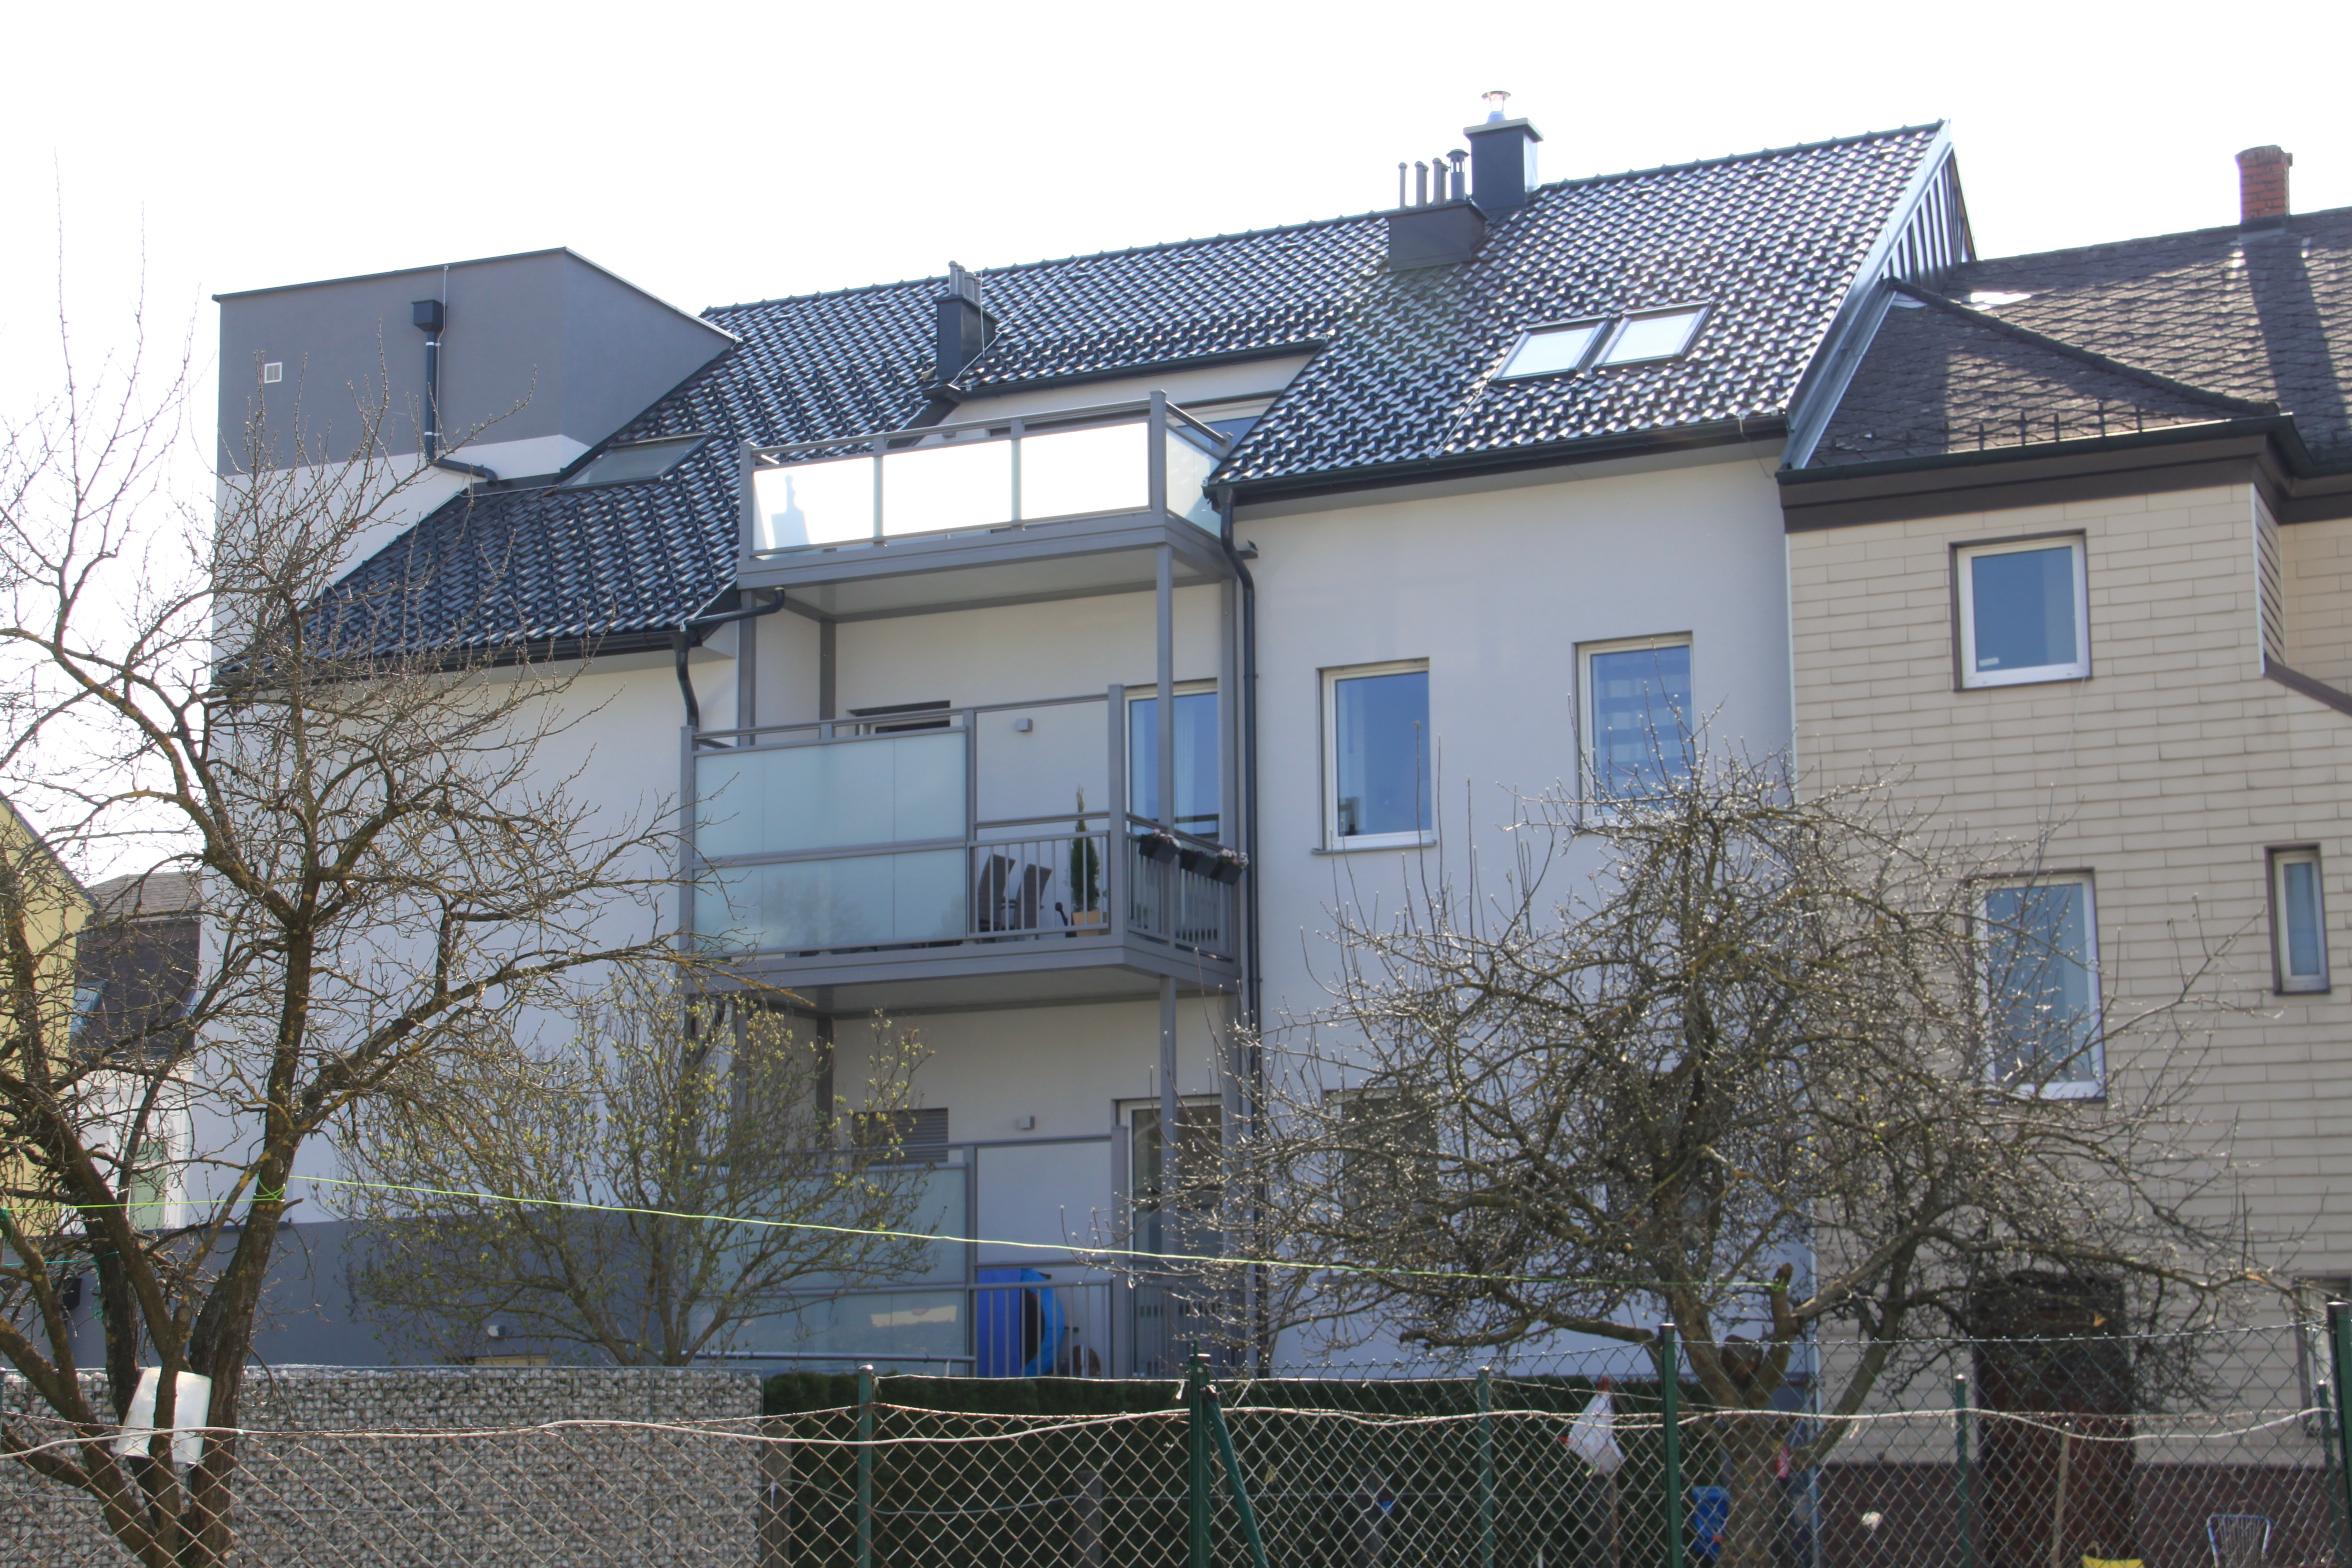 http://www.der-bauberater.at/wp-content/uploads/2017/10/Mehrfamilienhaus_03.jpg